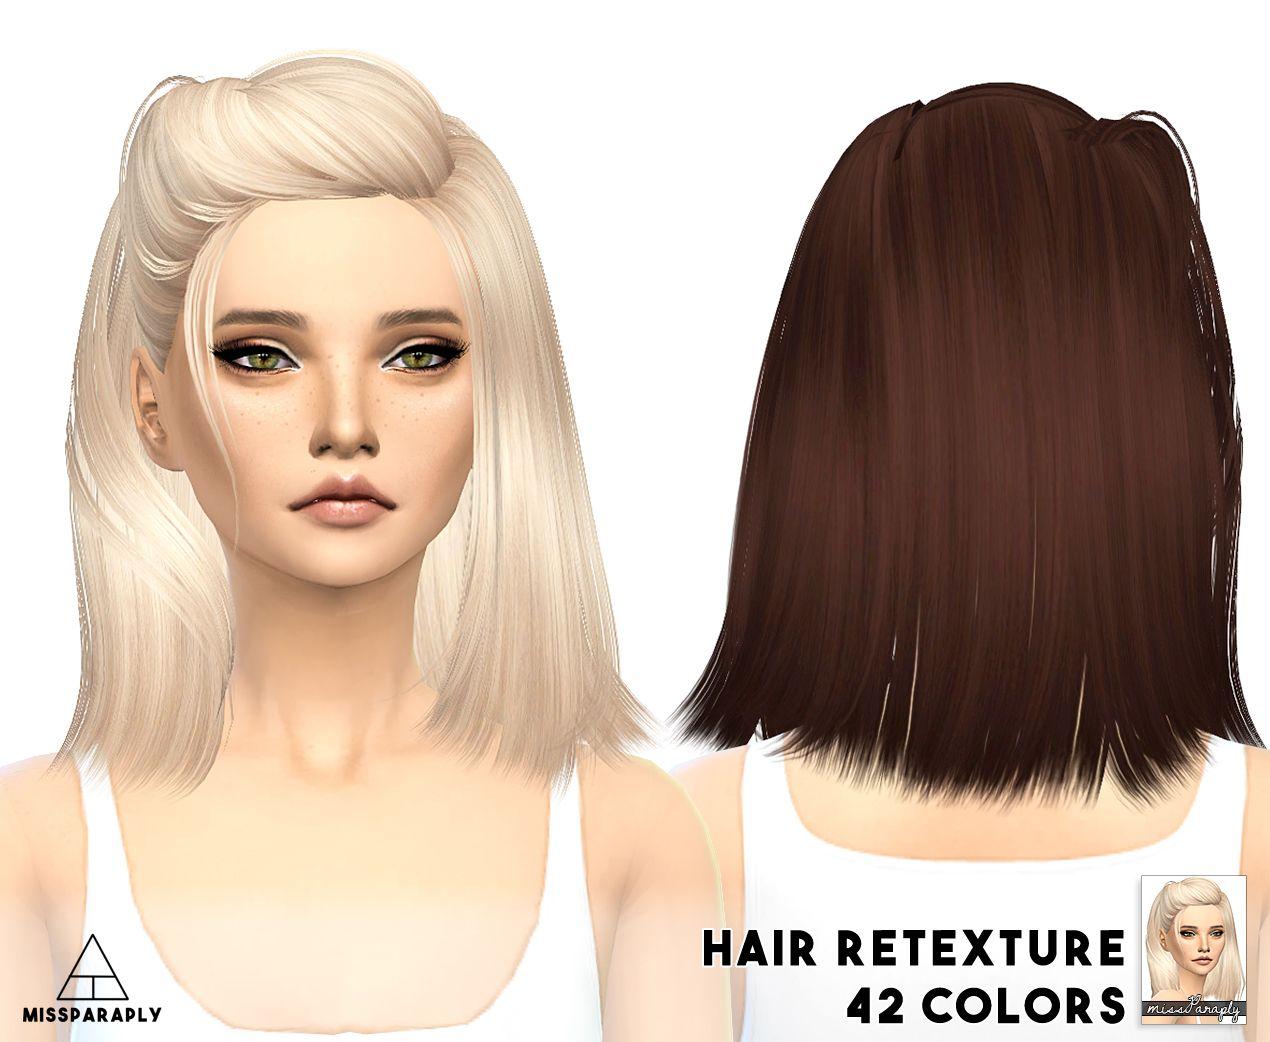 Beautiful Shoulder Length Hair Sims Hair Shoulder Length Hair Hairstyle